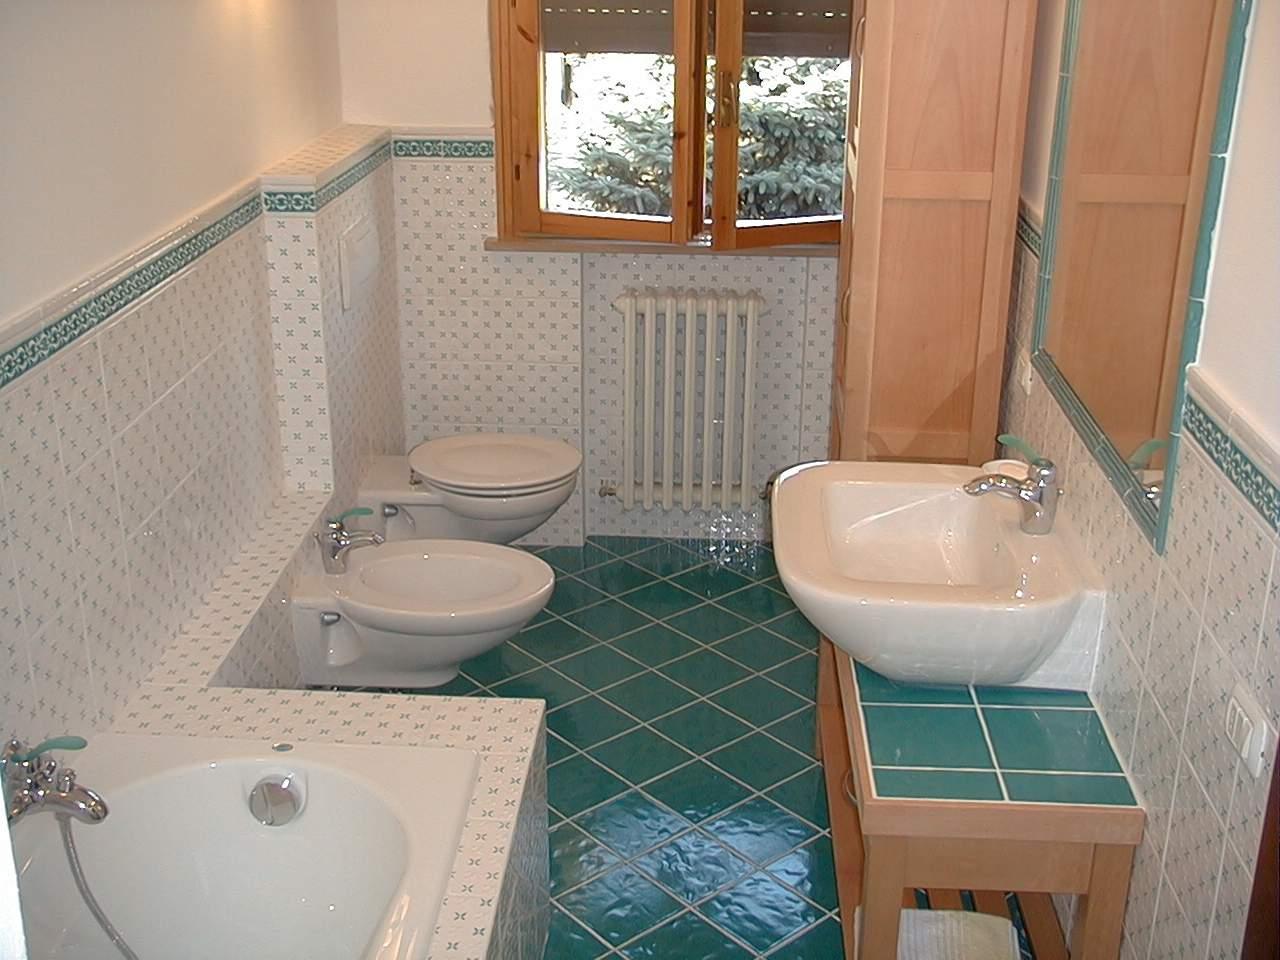 Idraulico a cosenza idraulico a rende cs - Pulire vasca da bagno ...